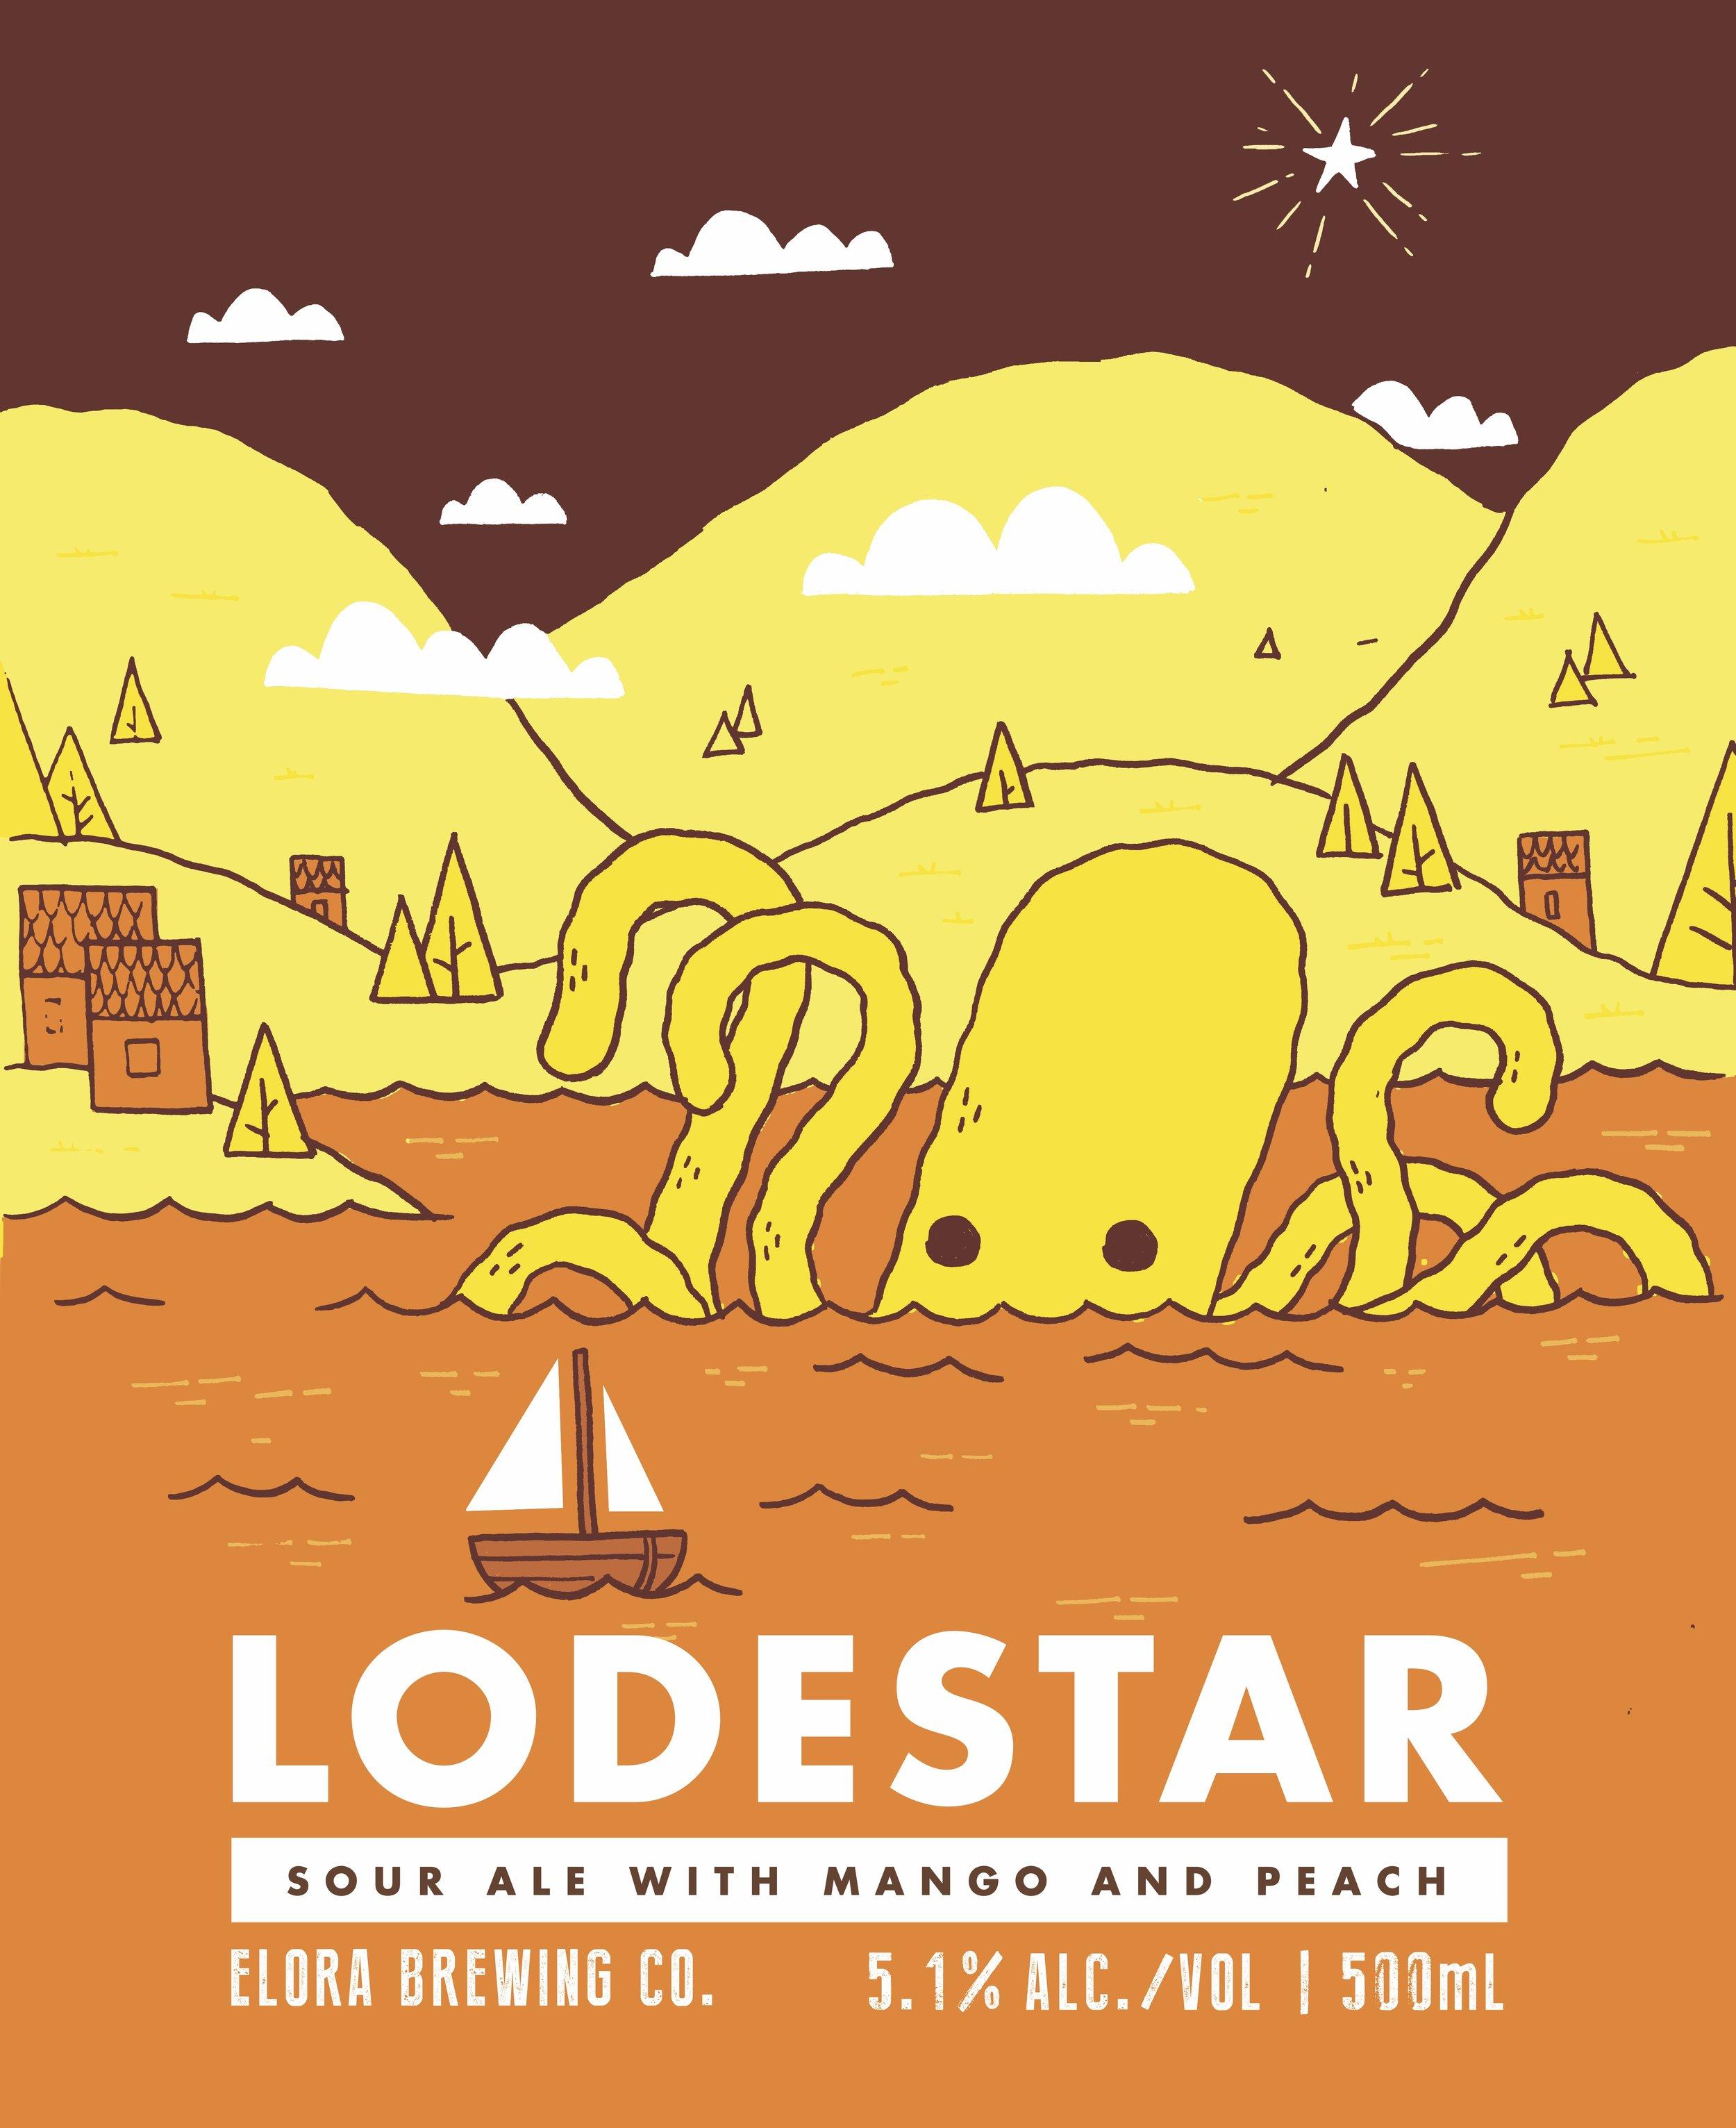 Lodestar-MangoPeach.jpg